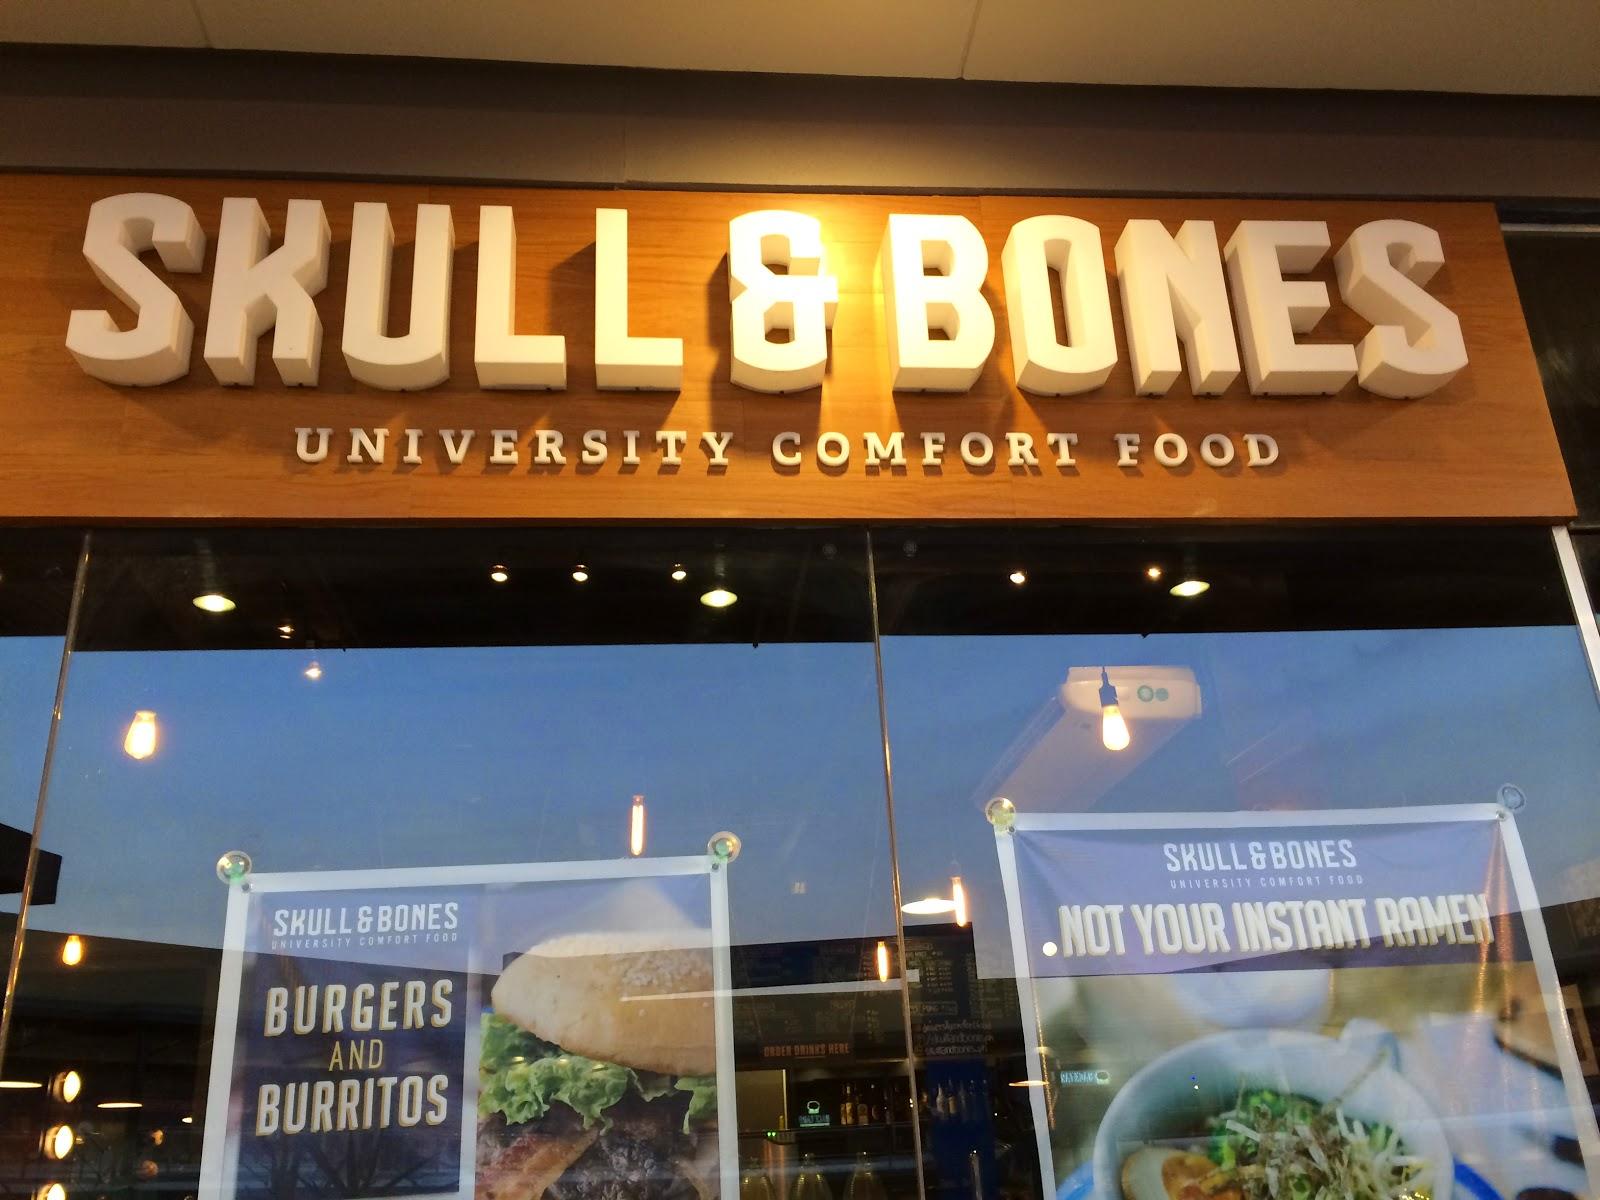 Skull & Bones University Food Comfort